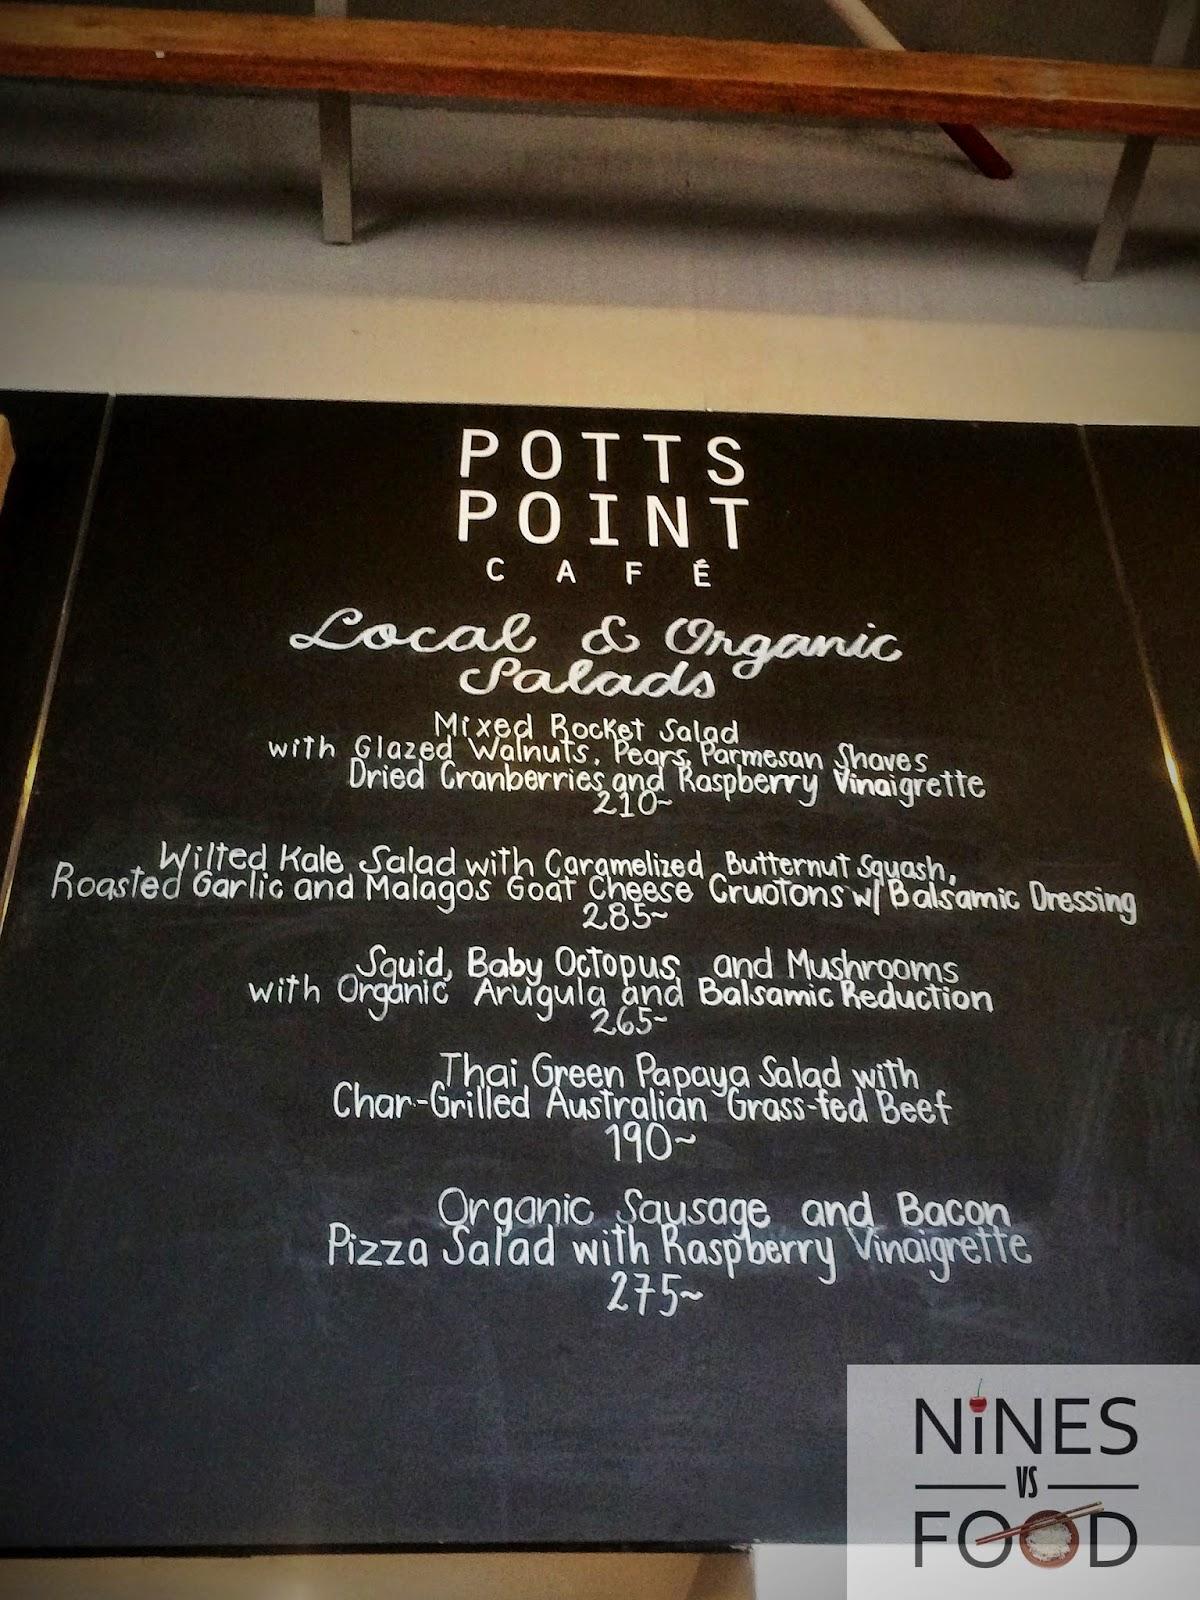 Nines vs. Food - Potts Point Cafe Eastwood-23.jpg